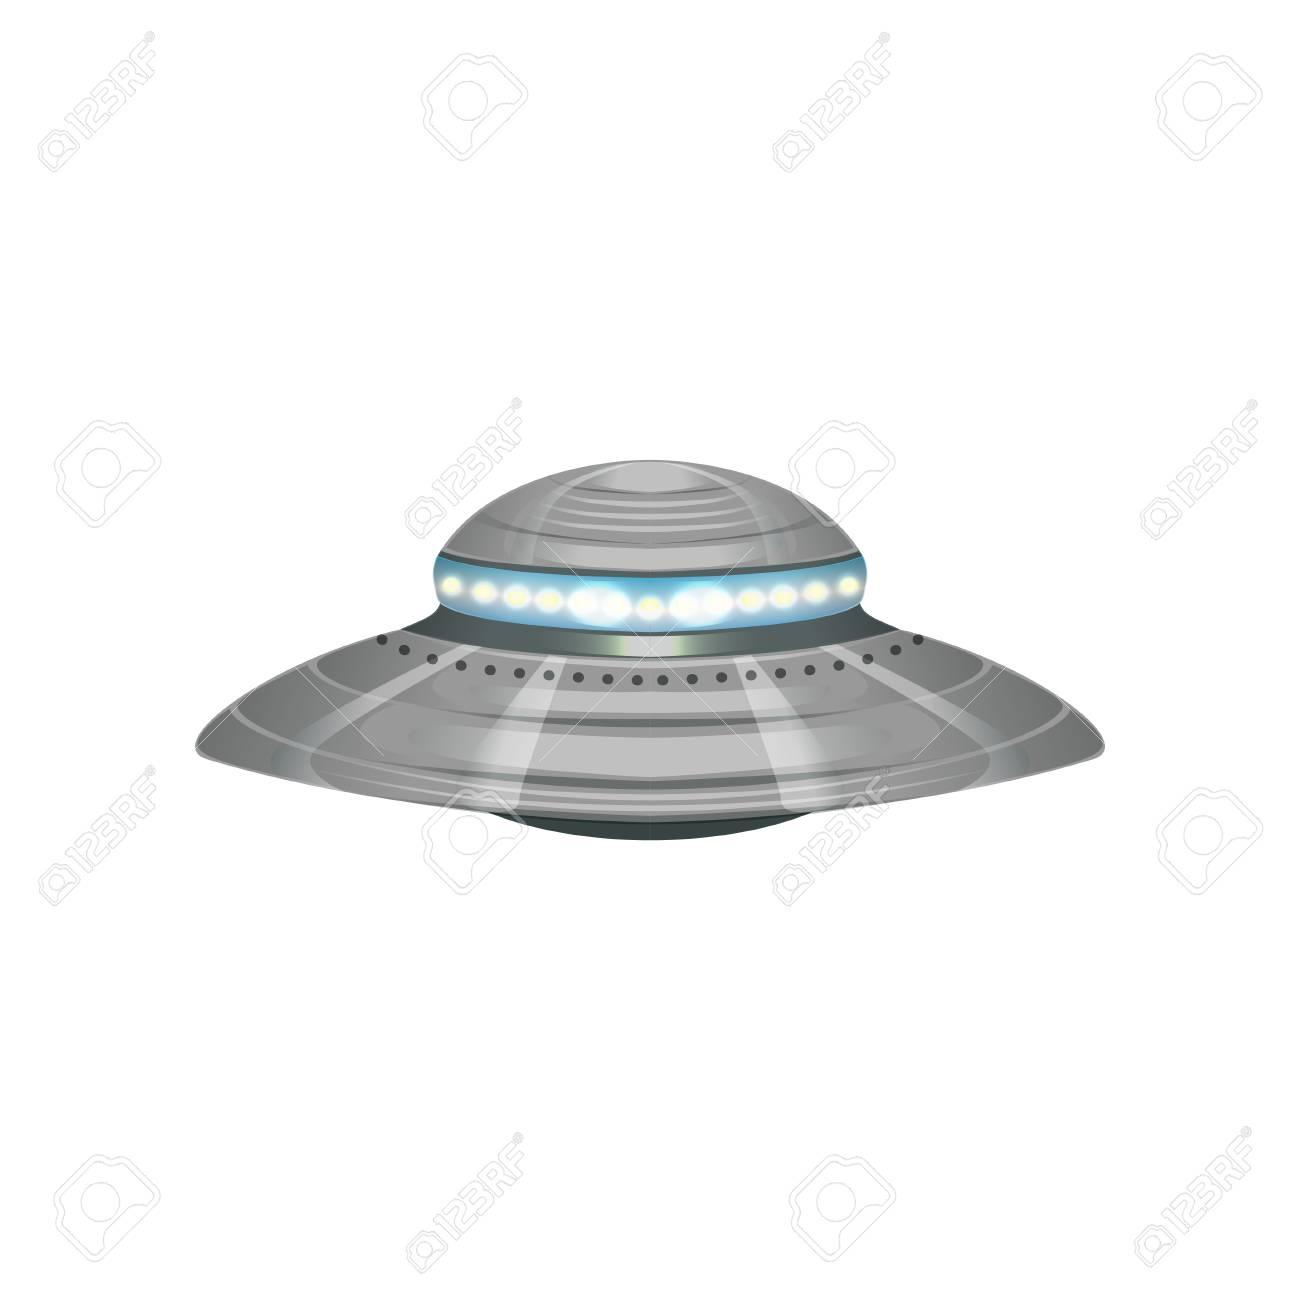 Cartoon Alien Flying Saucer. Extraterrestrial Space Ship. UFO.